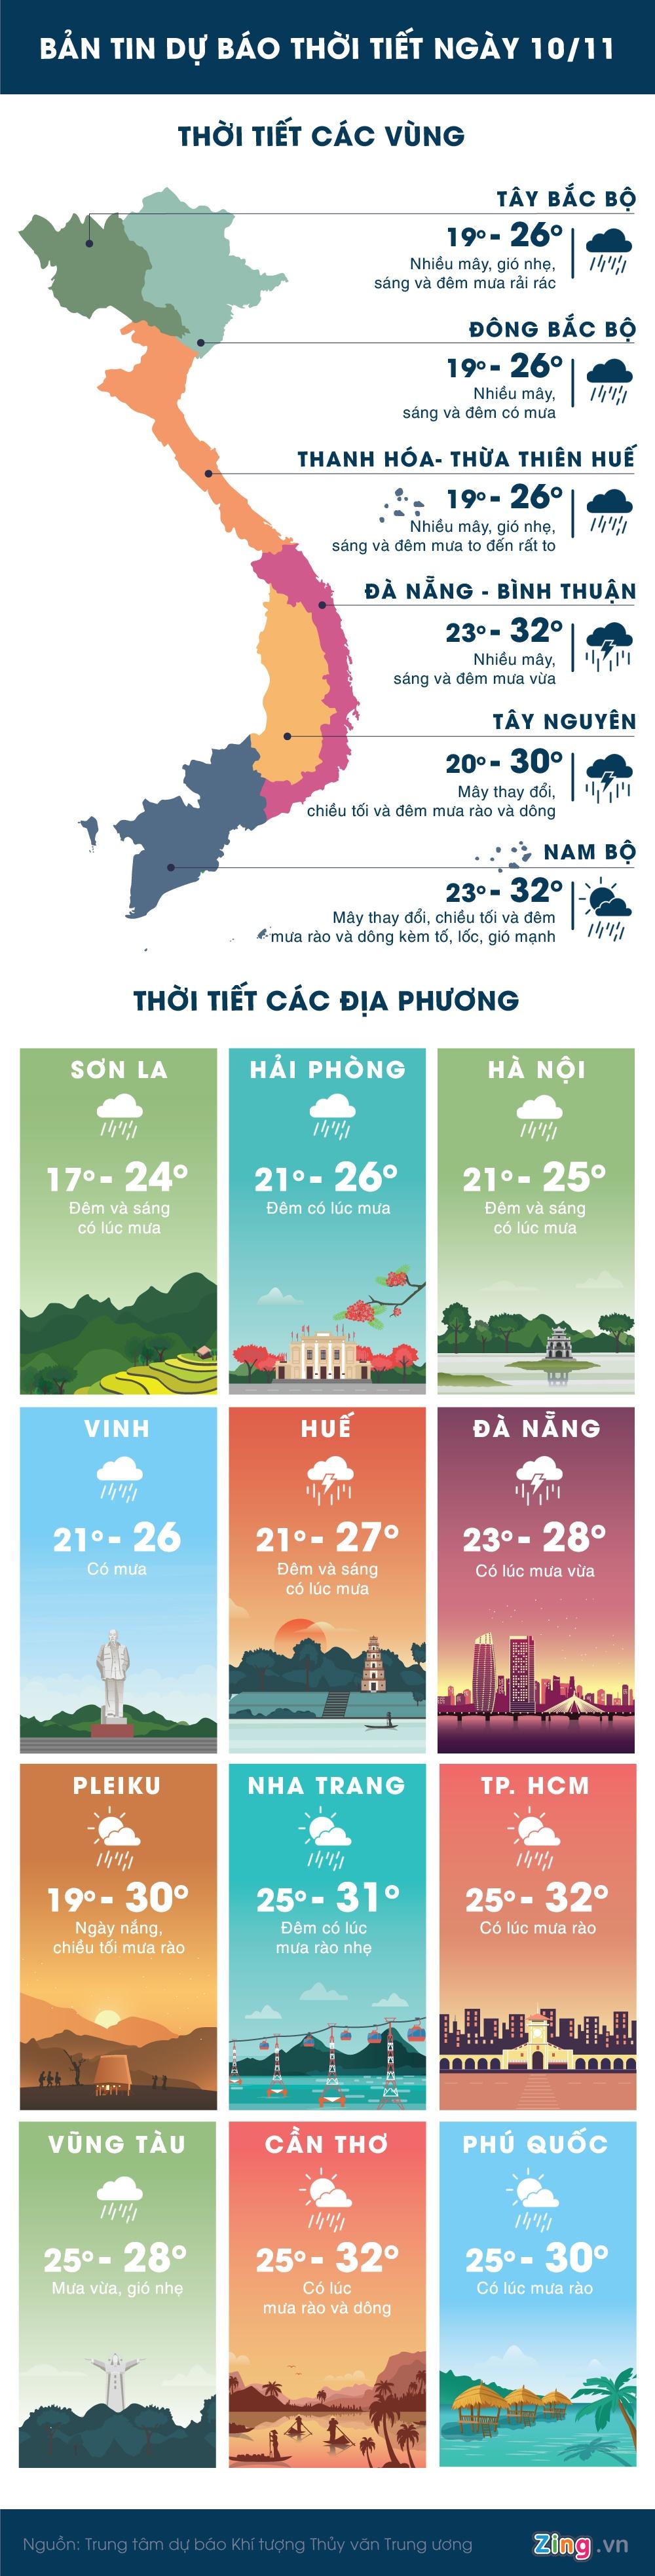 Thoi tiet 10/11: Mien Trung va Nam Bo mua lon hinh anh 1